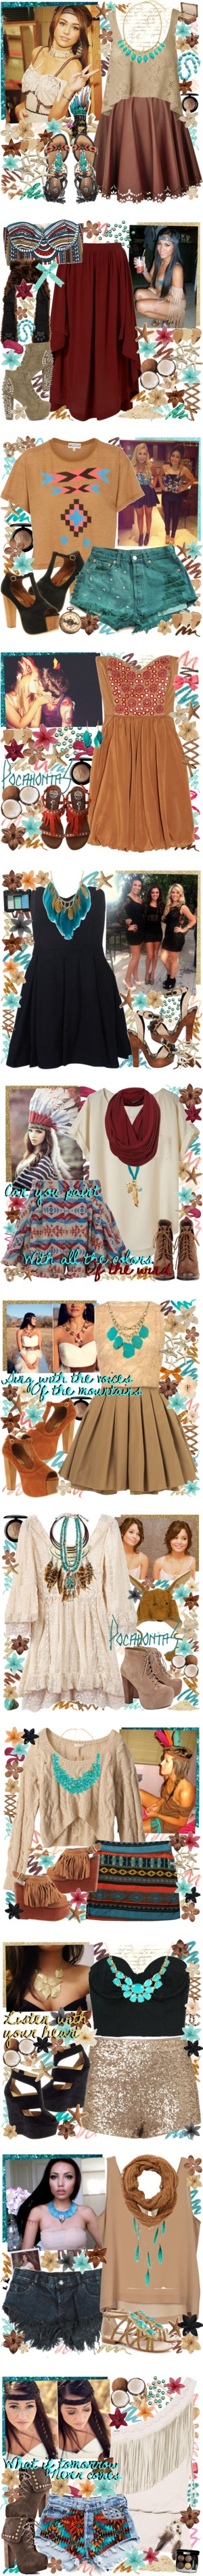 """Pocahontas Inspired Sets"" by elaine-elizabethxo ❤ liked on Polyvore"